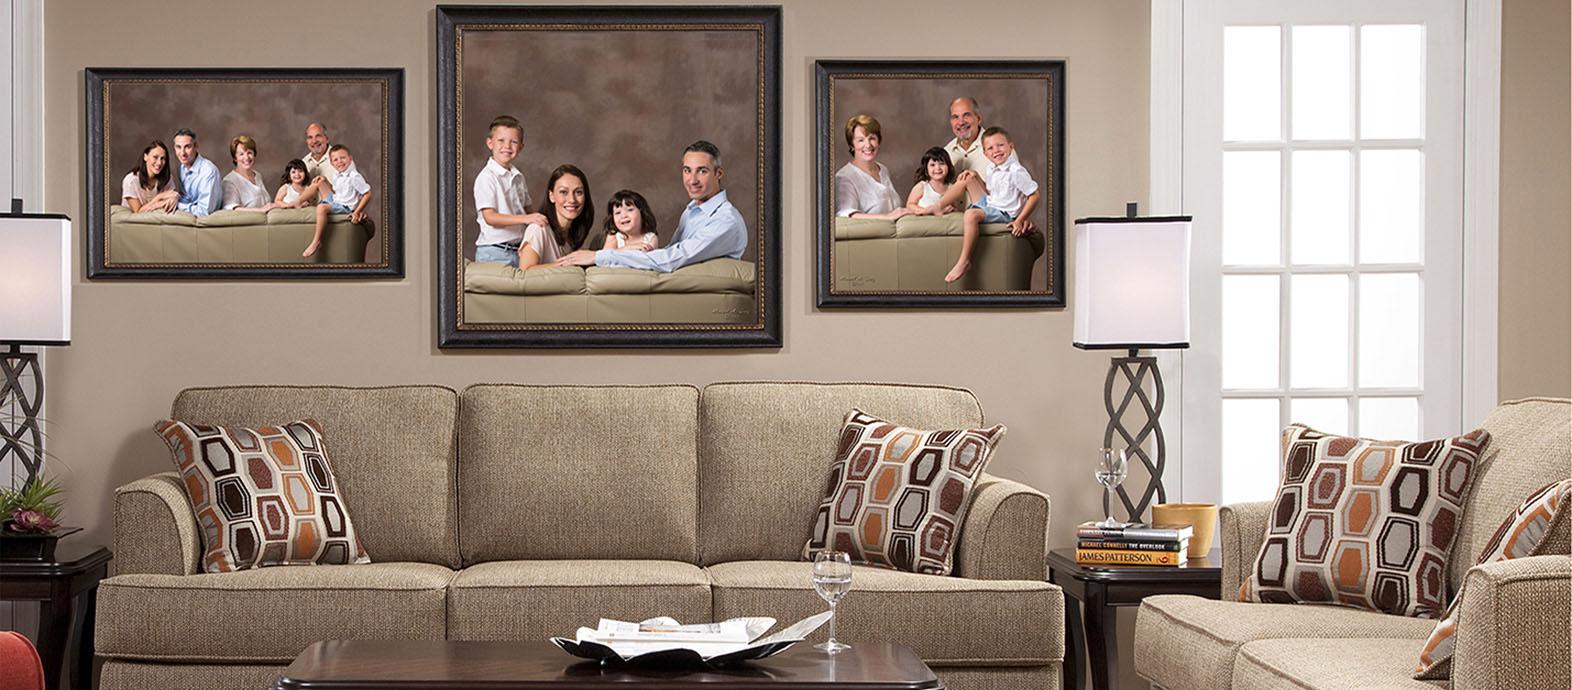 Multi-Generational-Family-Portrait-in-studio-1